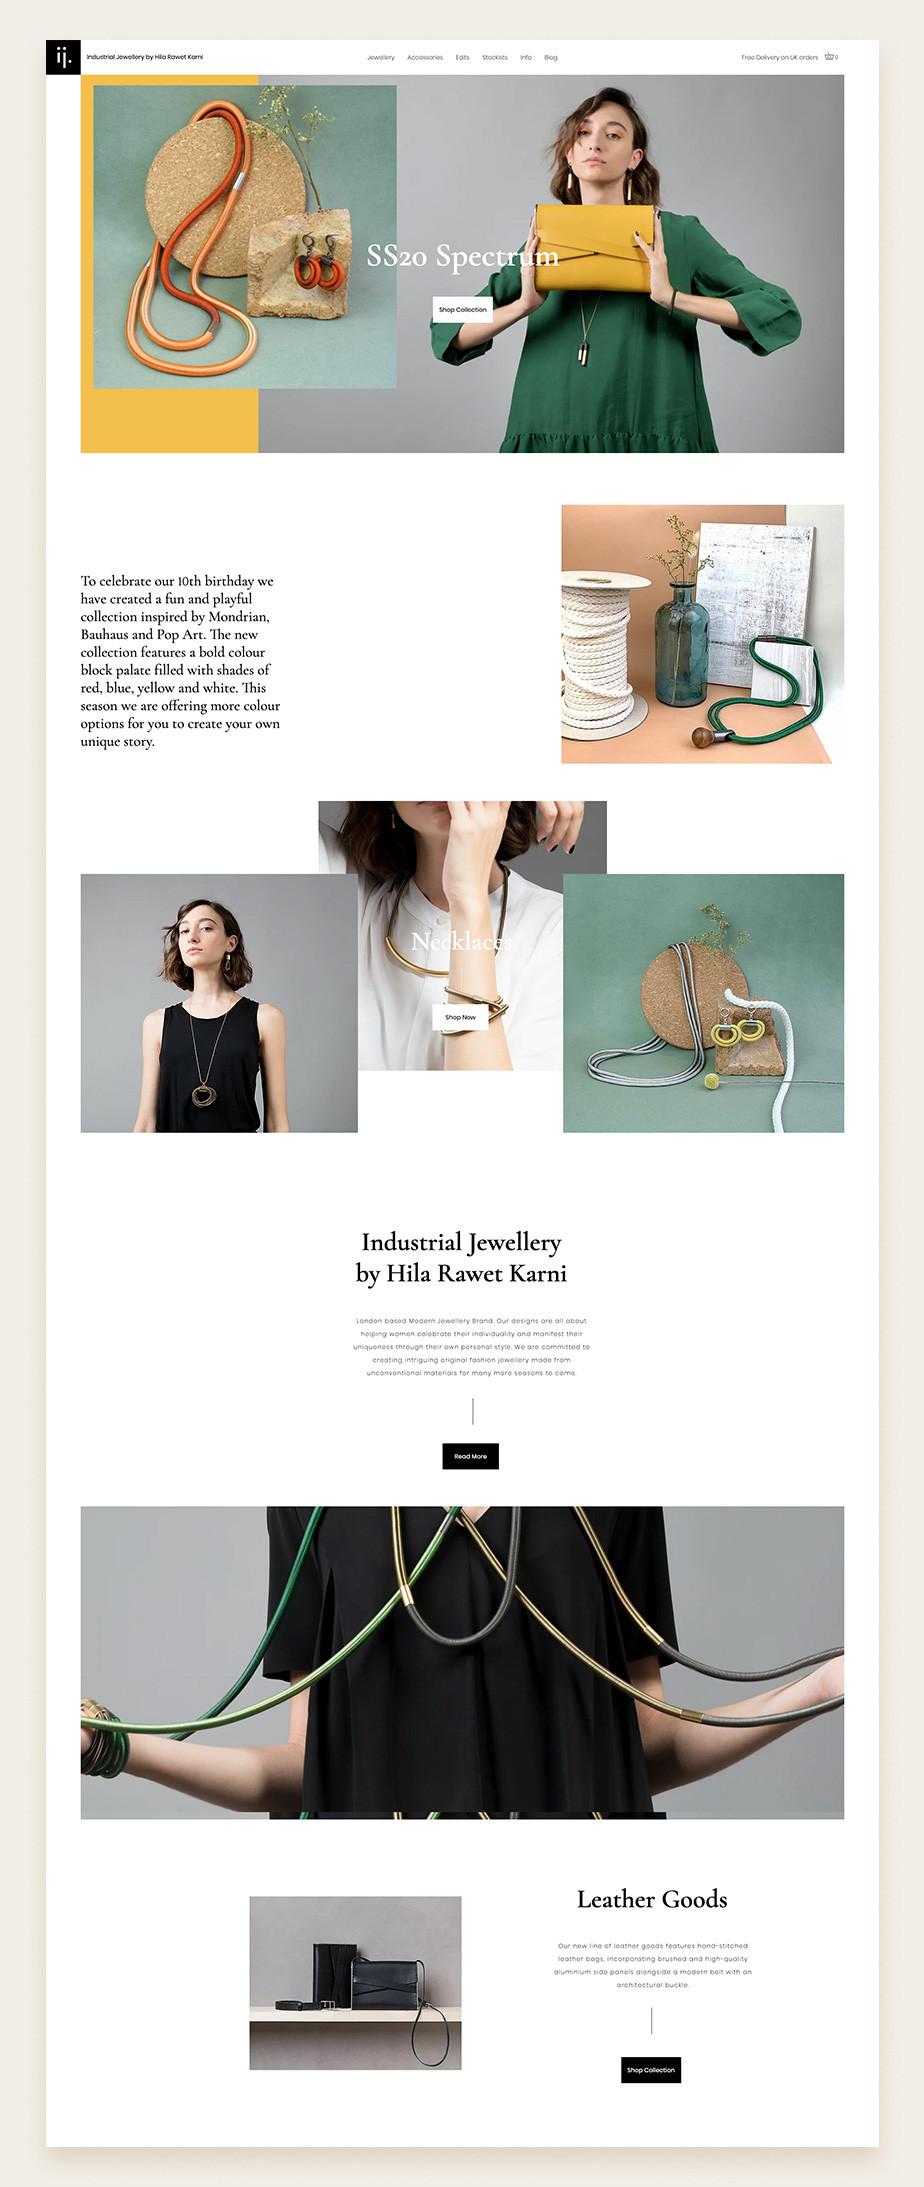 eCommerce de joyería de Hila Rawet Karni, sitio web de Wix